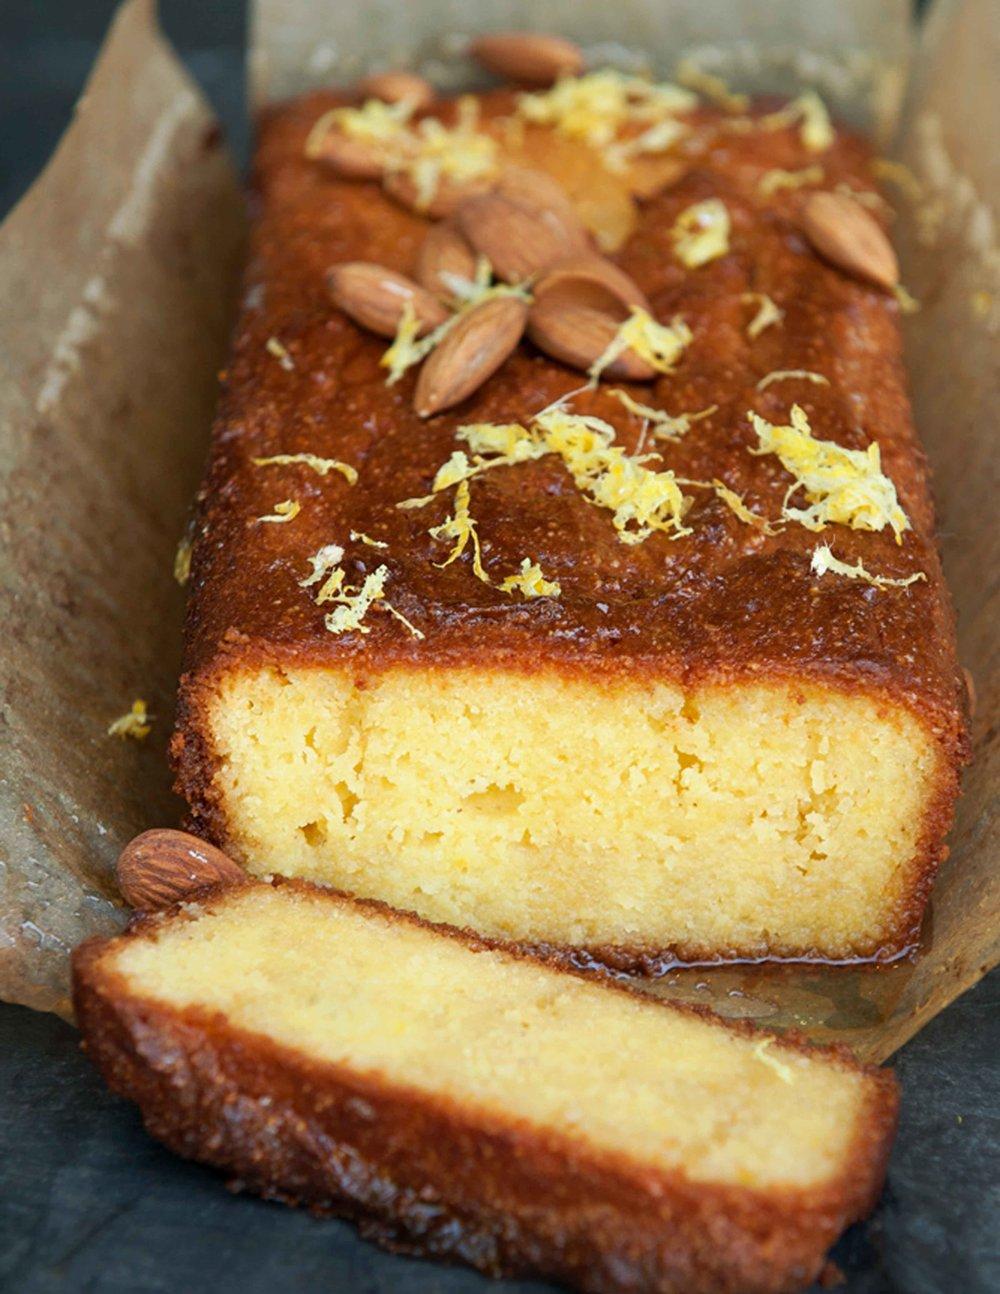 NG_073 - Lemon Cake Vertical.jpg